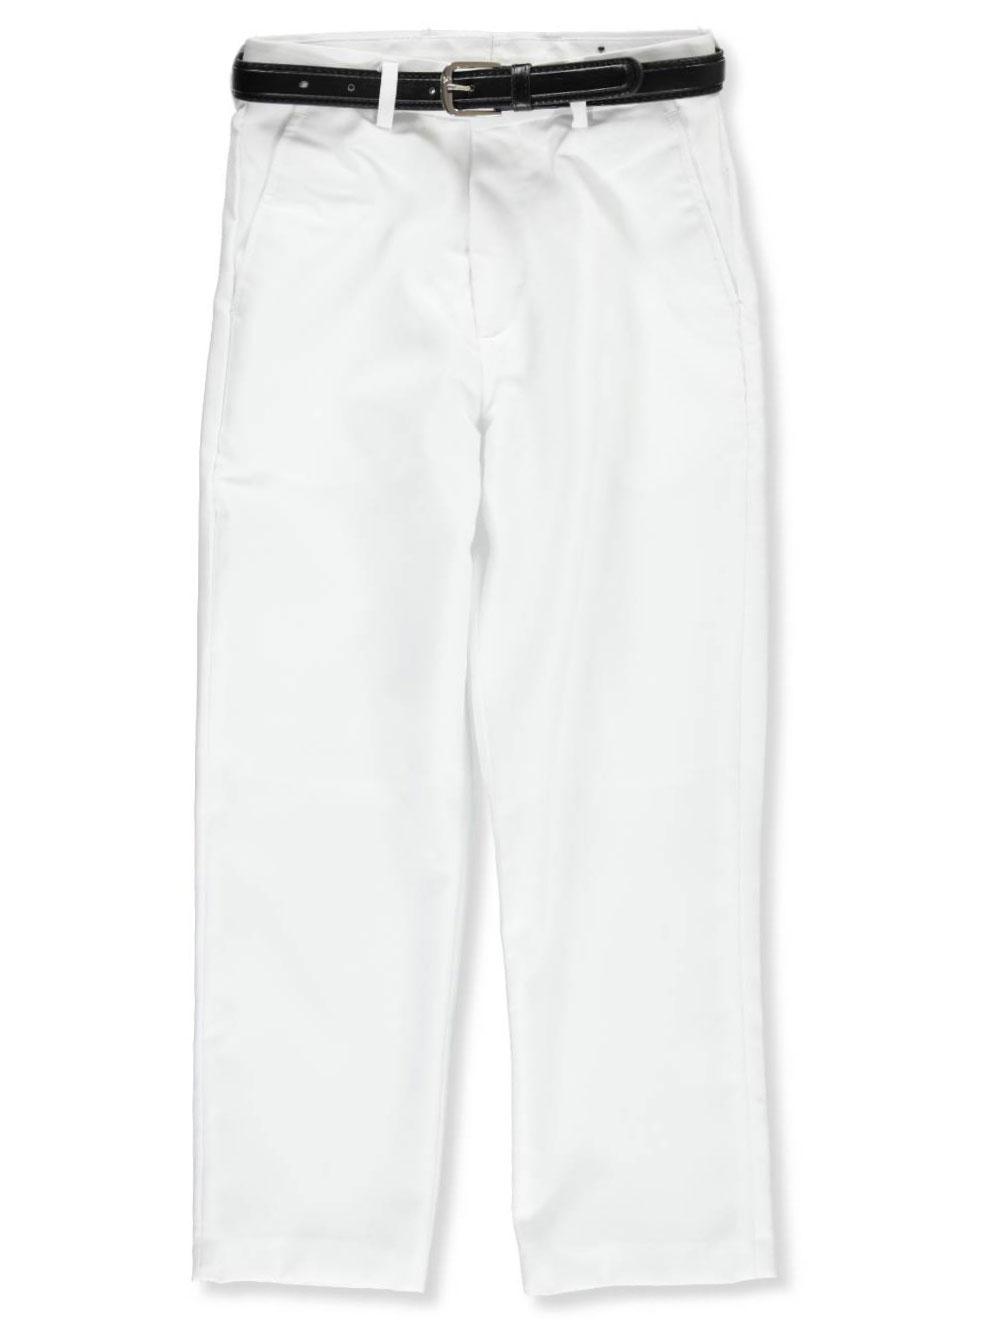 Kidz World Vittorino Big Boys Husky Flat Front Slim Fit Dress Pants